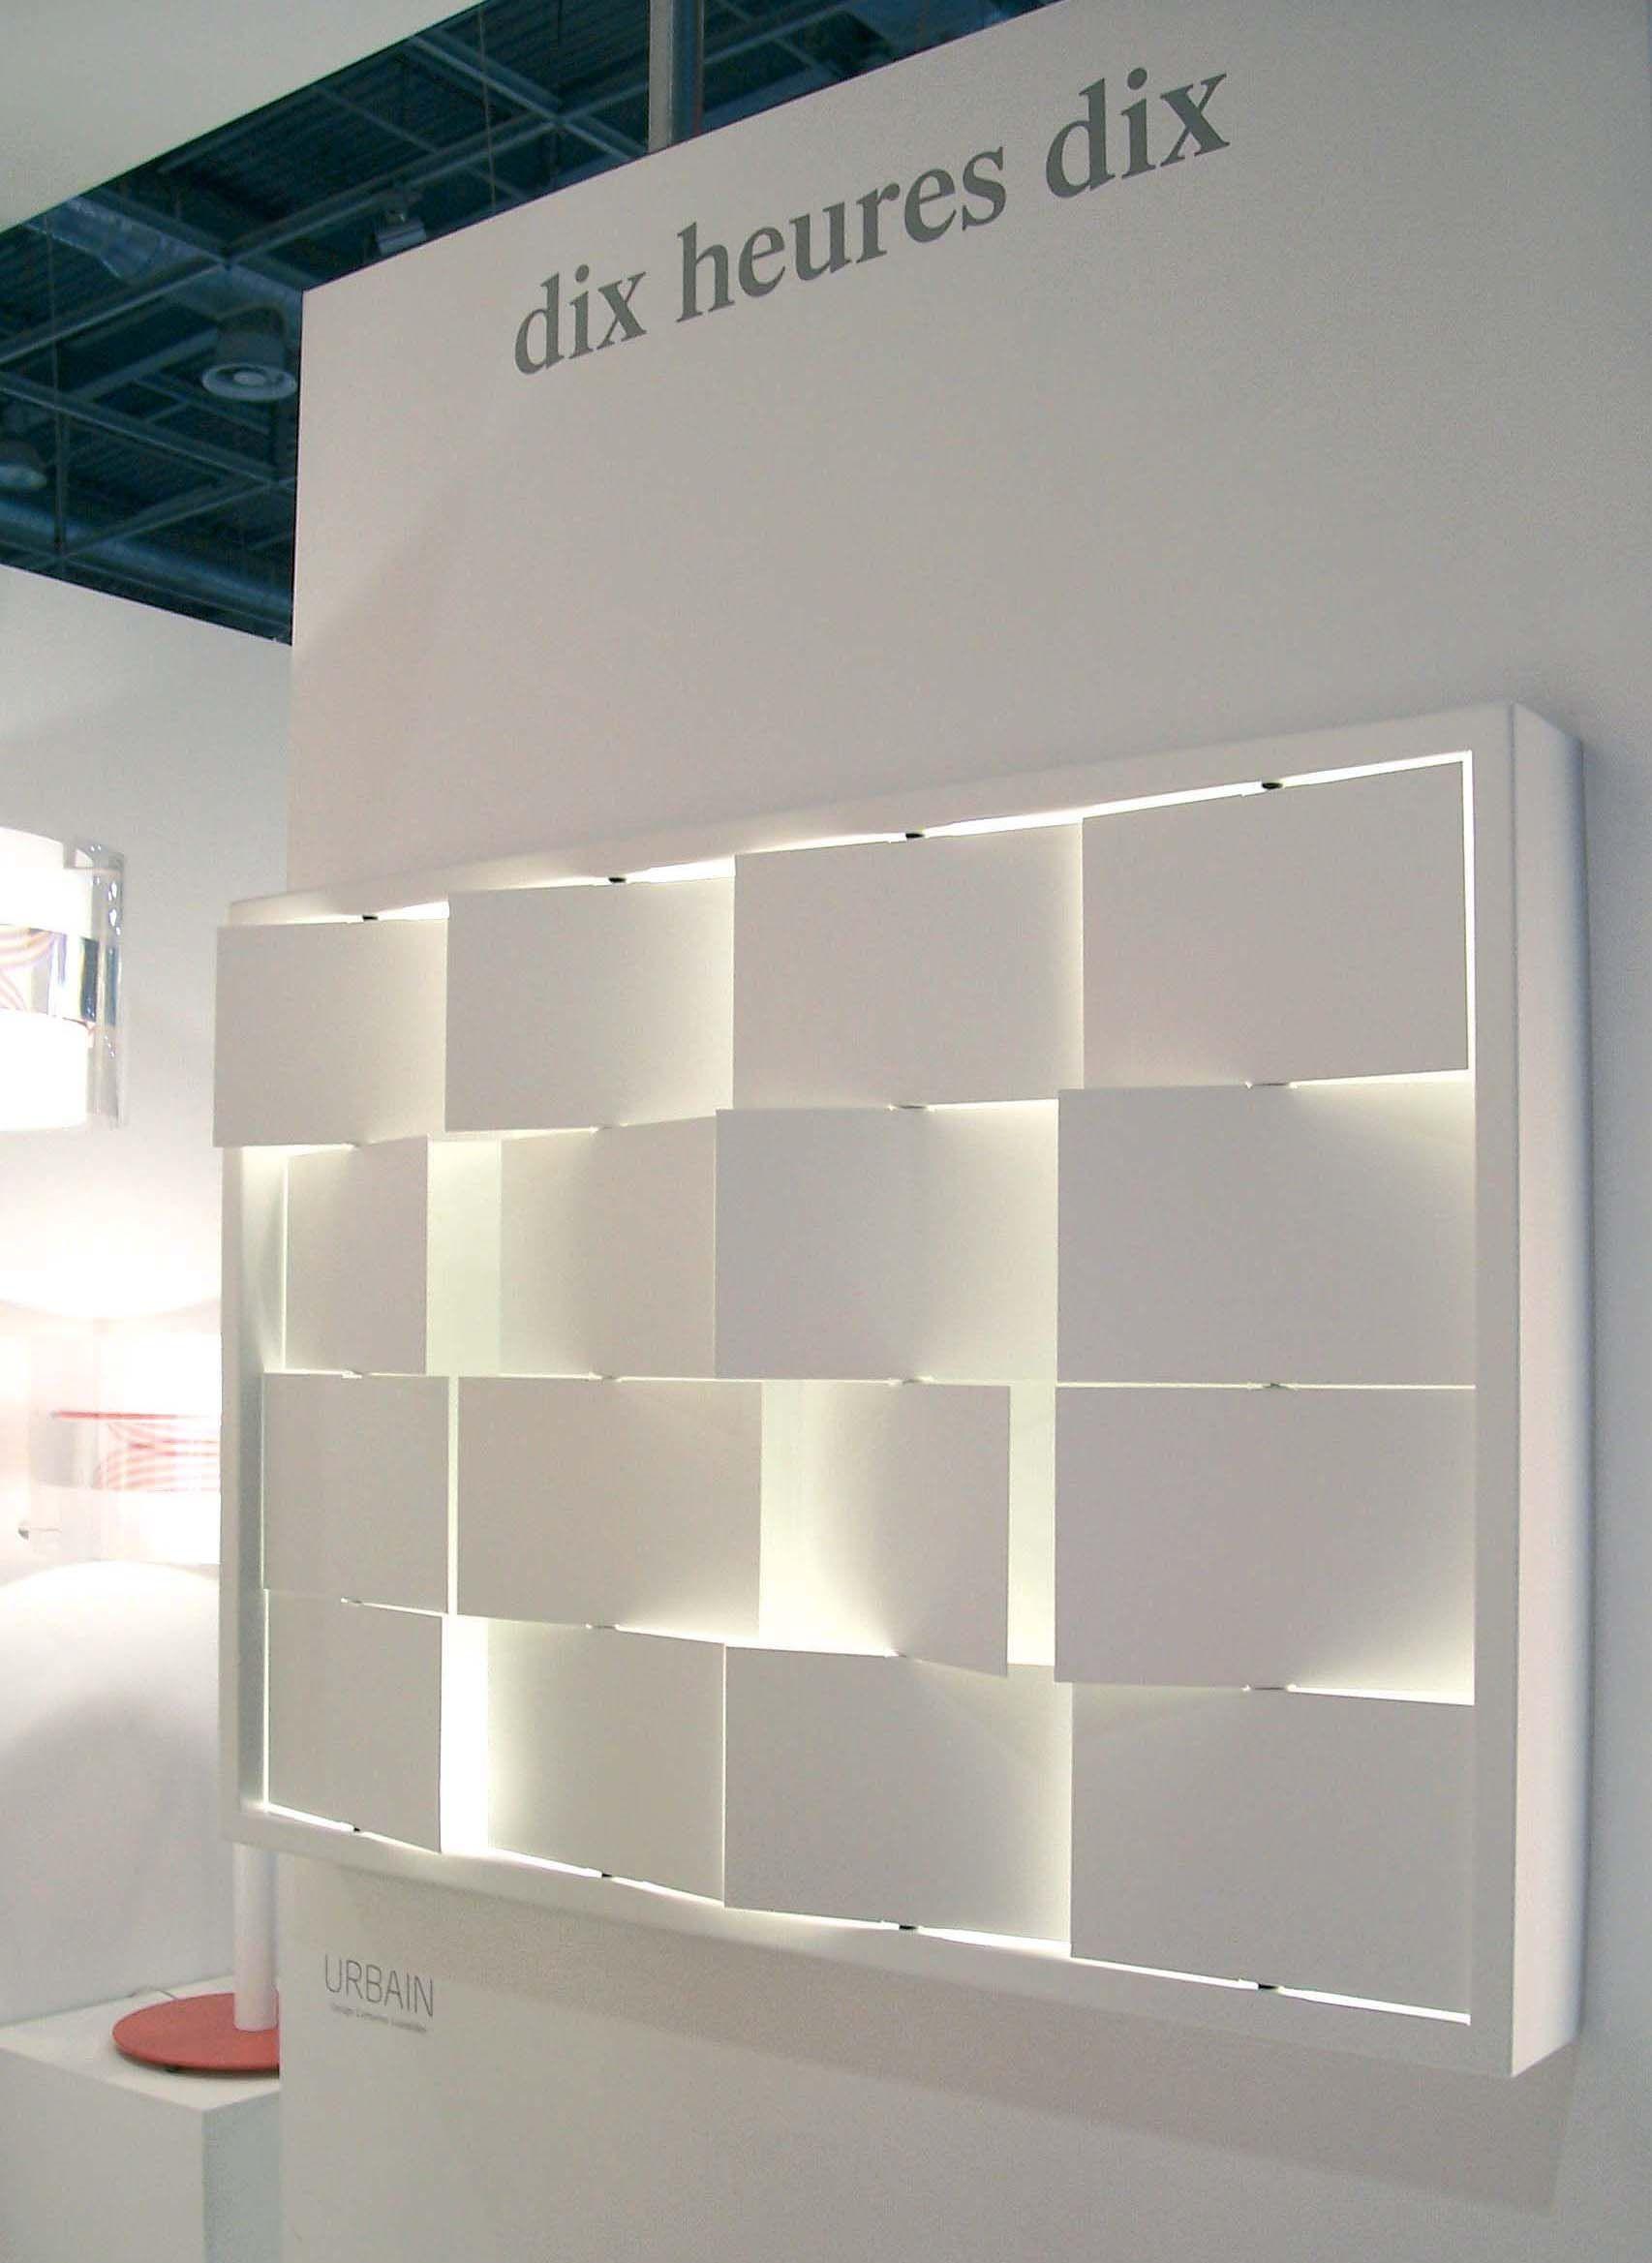 applique urbain blanc blanc dix heures dix. Black Bedroom Furniture Sets. Home Design Ideas